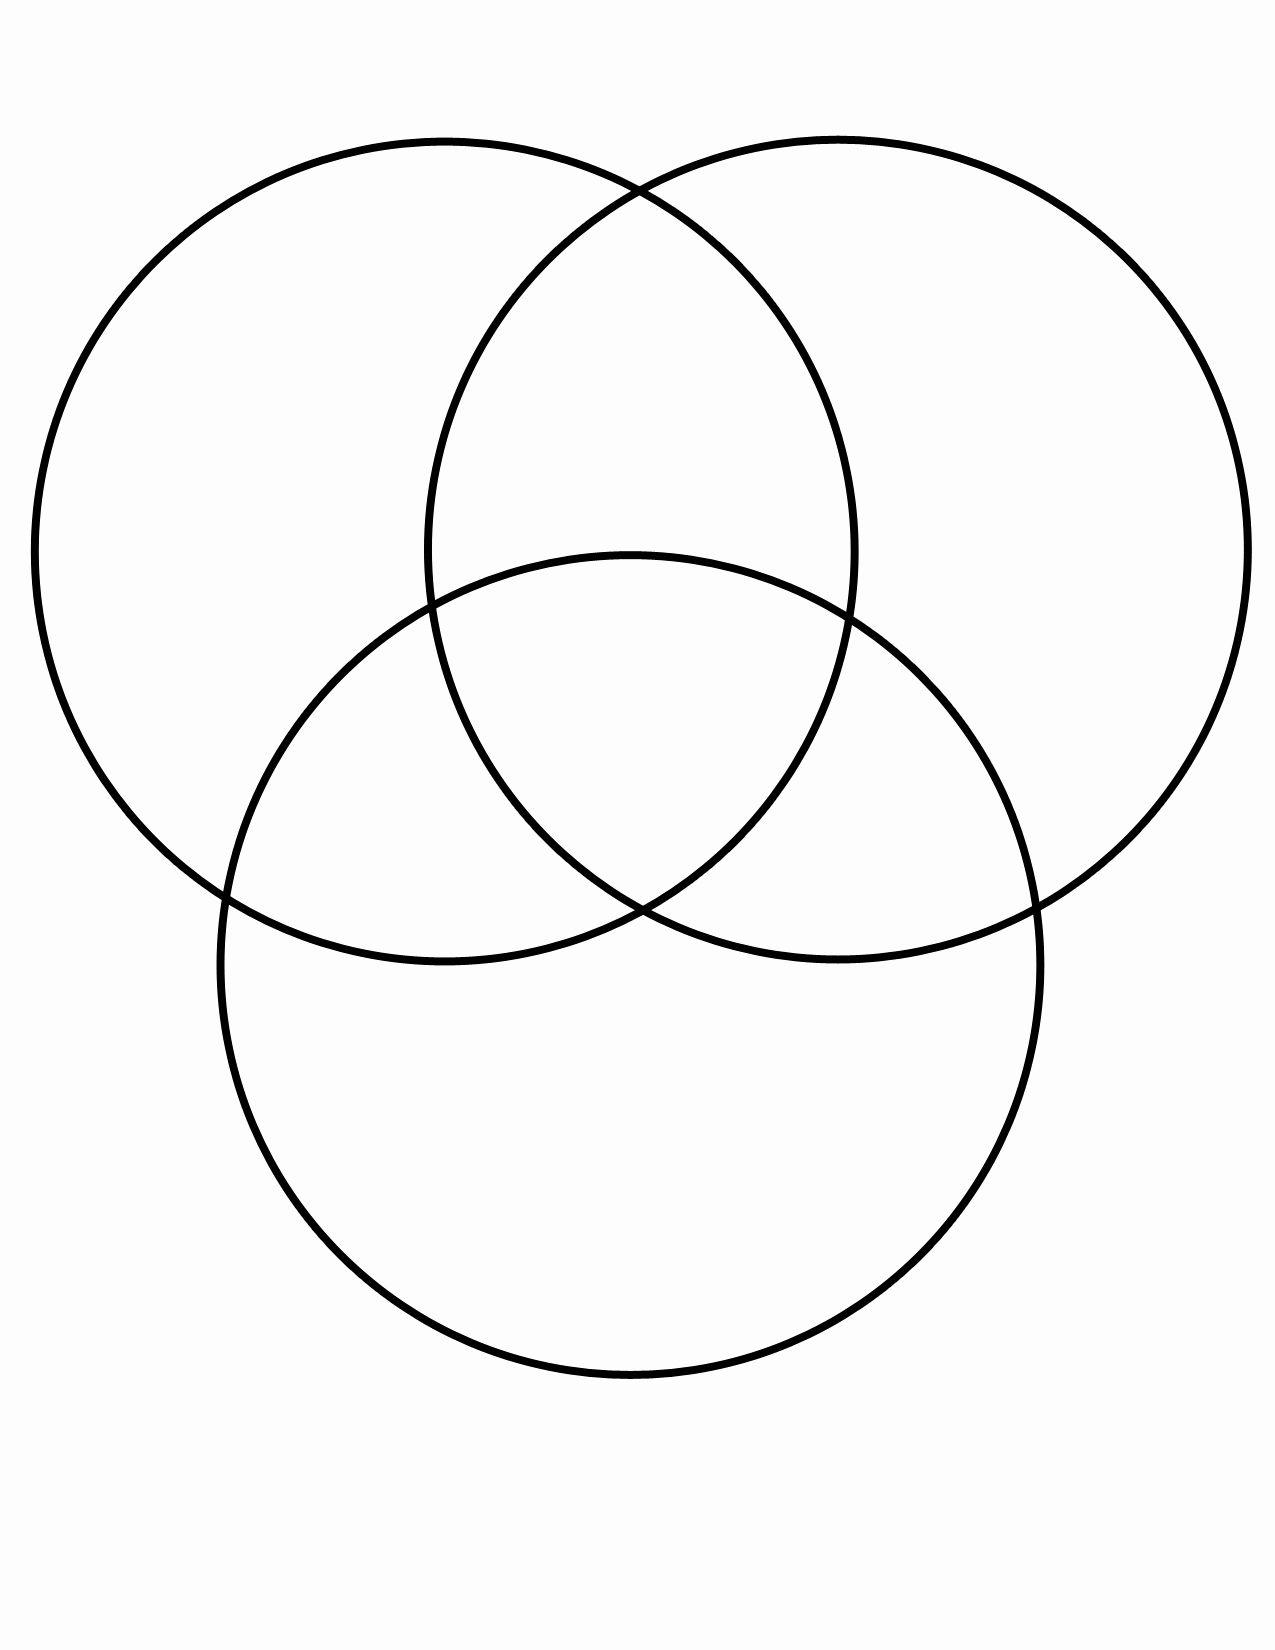 Venn Diagram To Print In 2020 Venn Diagram Template Venn Diagram